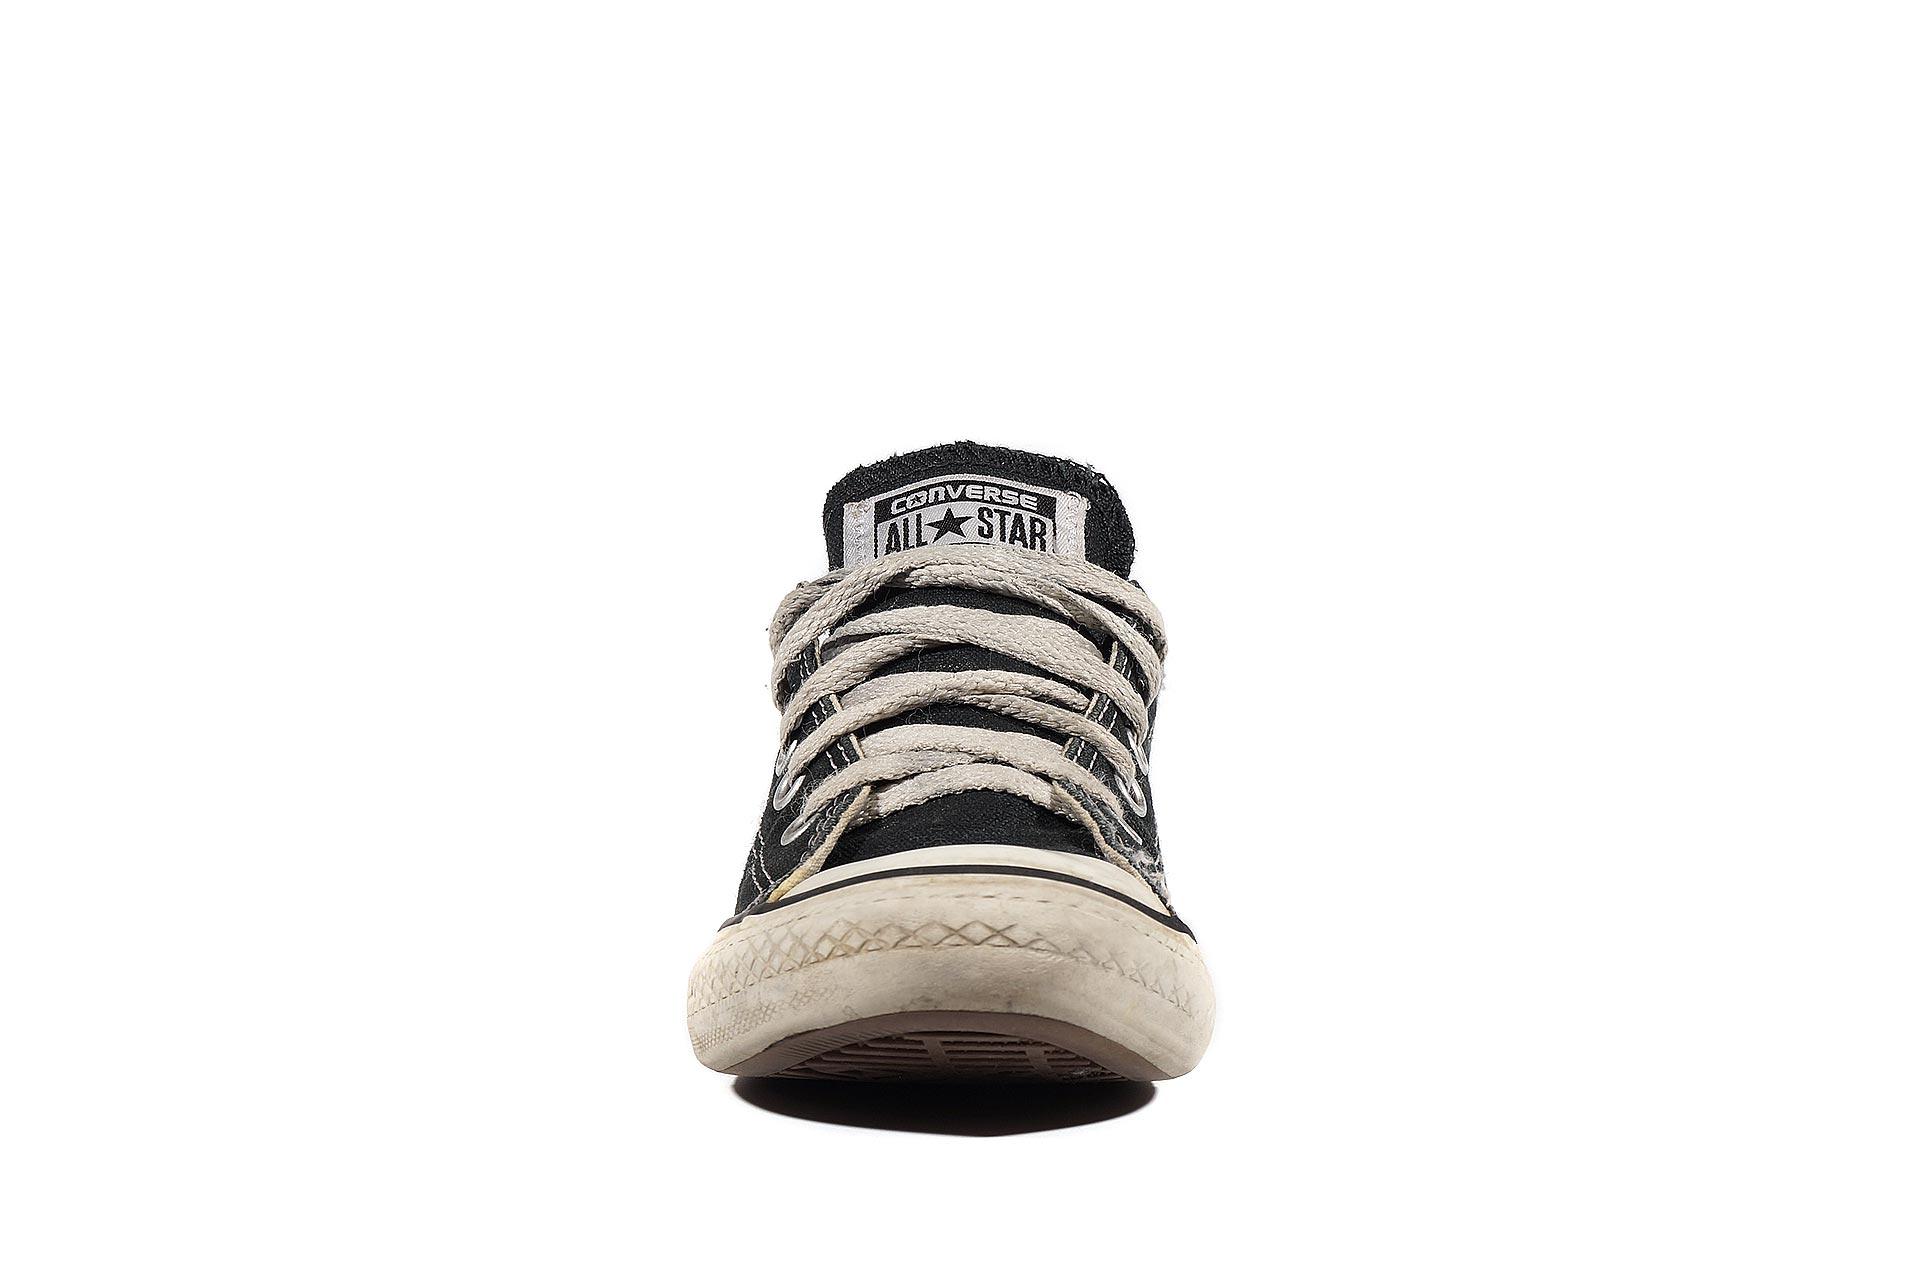 Детские кеды Converse Chuck Taylor All Star 3J235 (00024-U) купить ... 20be456e7b0